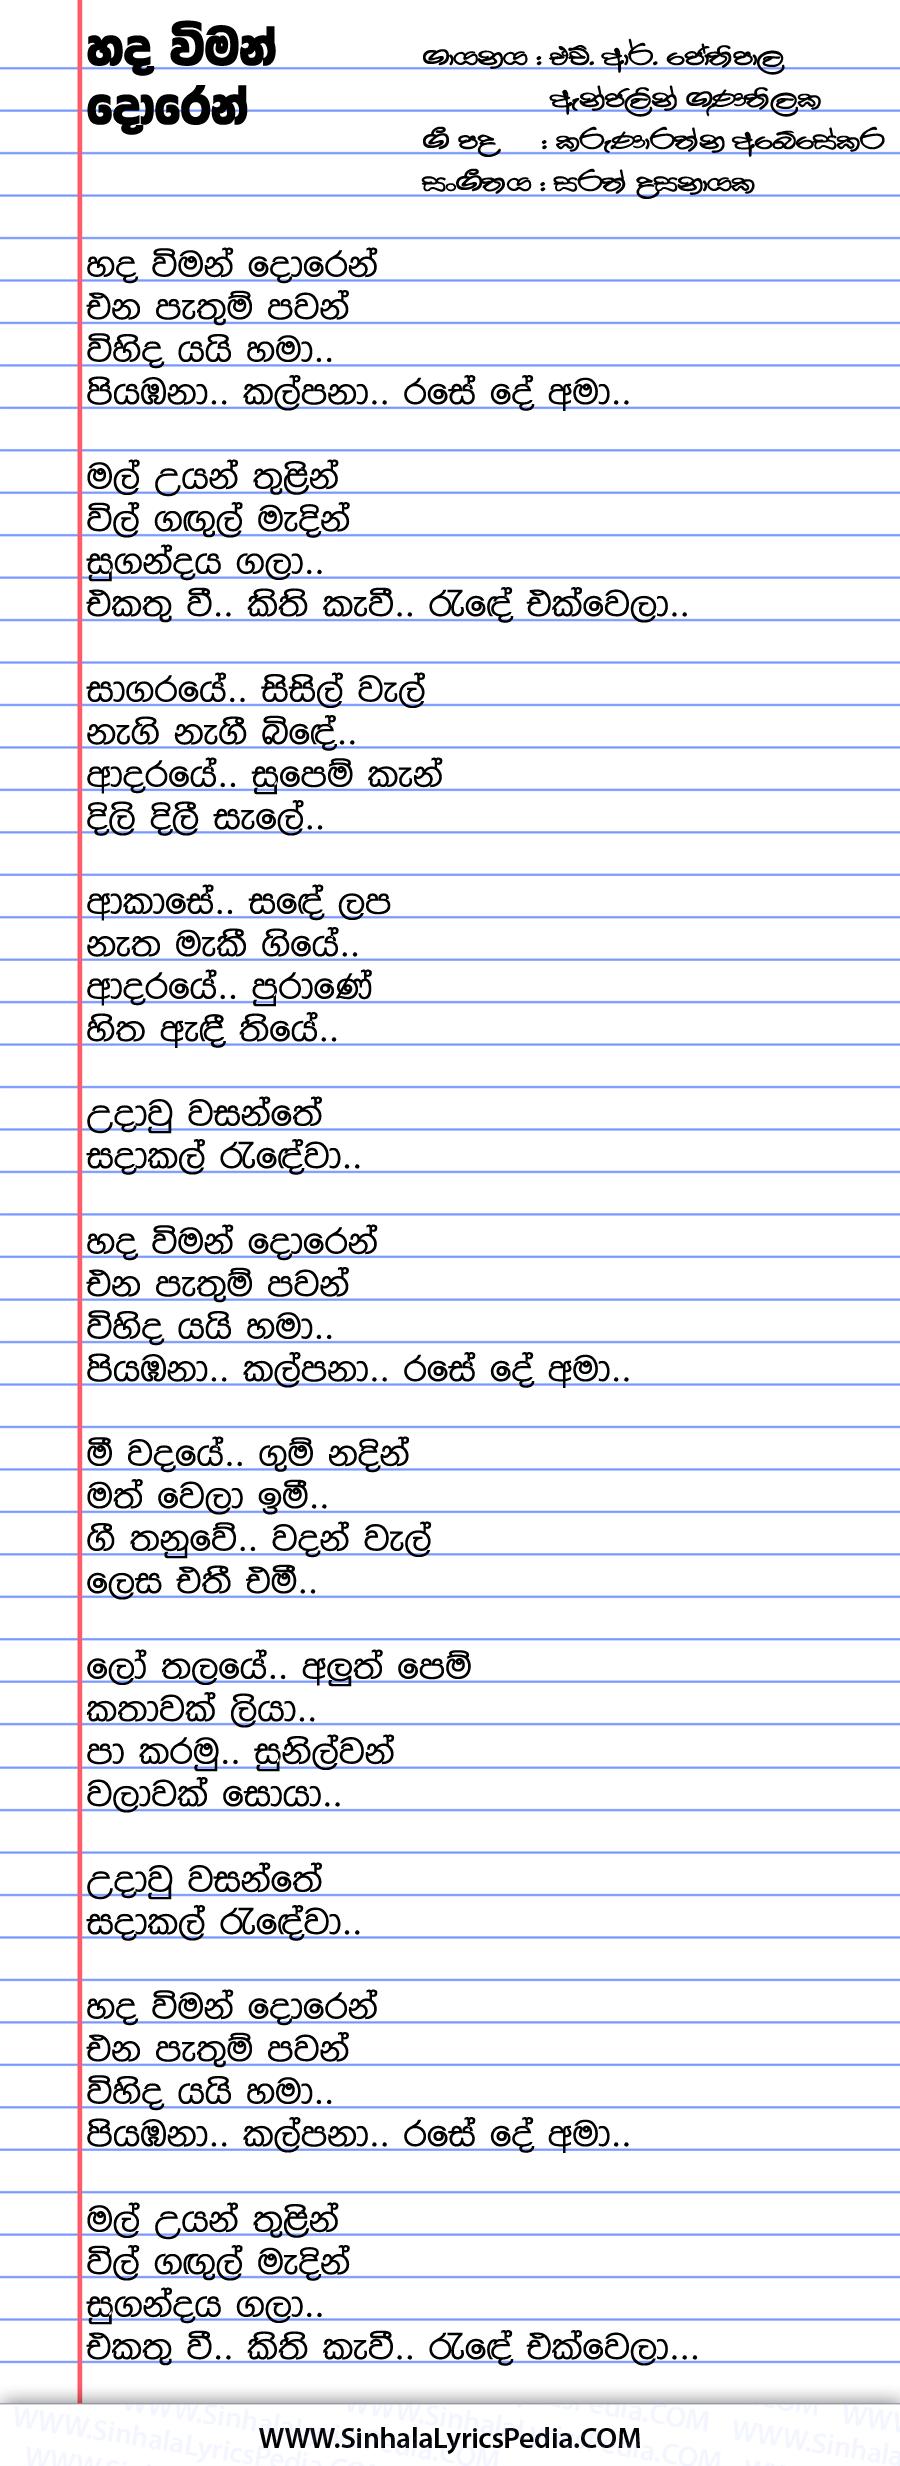 Hada Wiman Dorin Song Lyrics